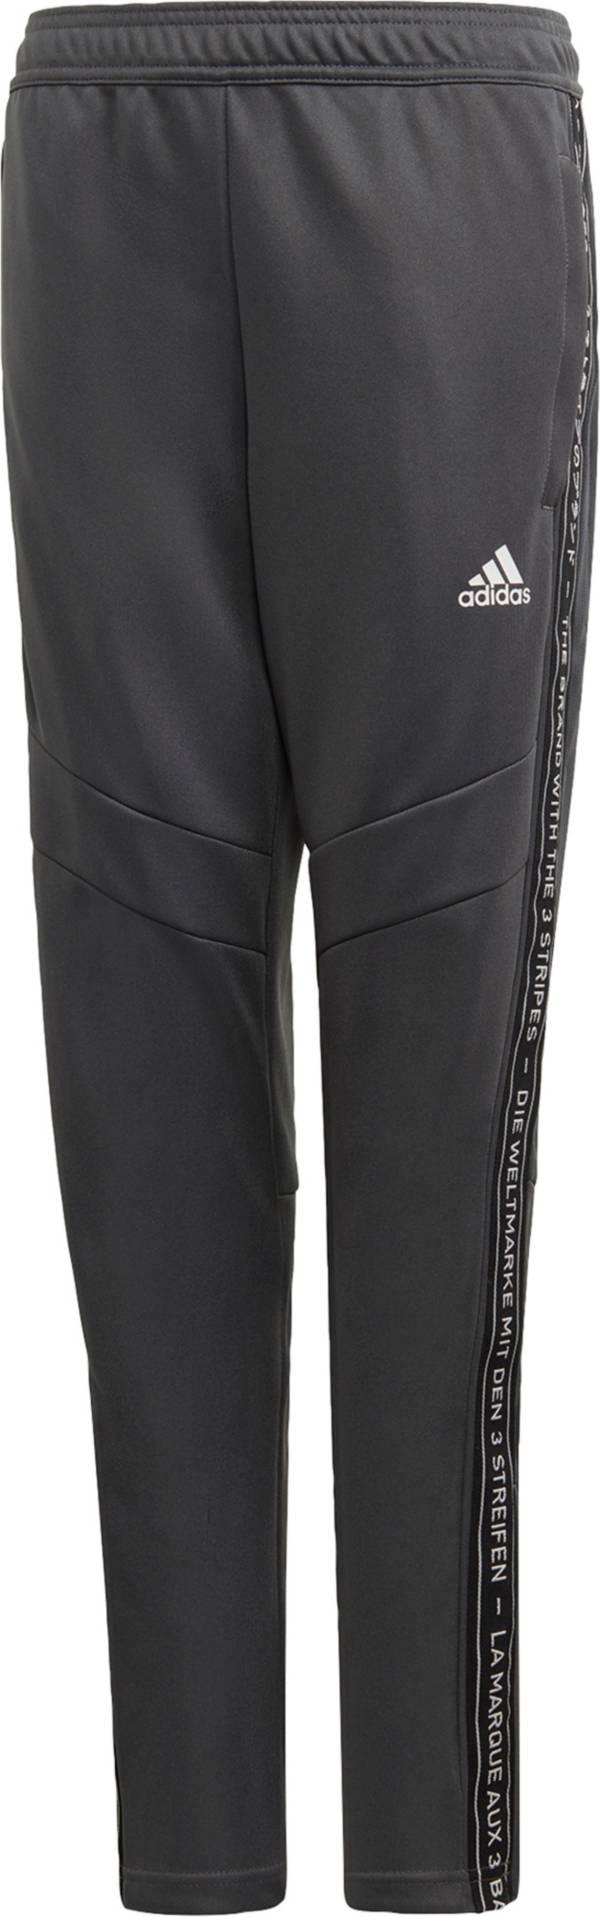 adidas Boys' Tiro 19 Taping Training Pants product image